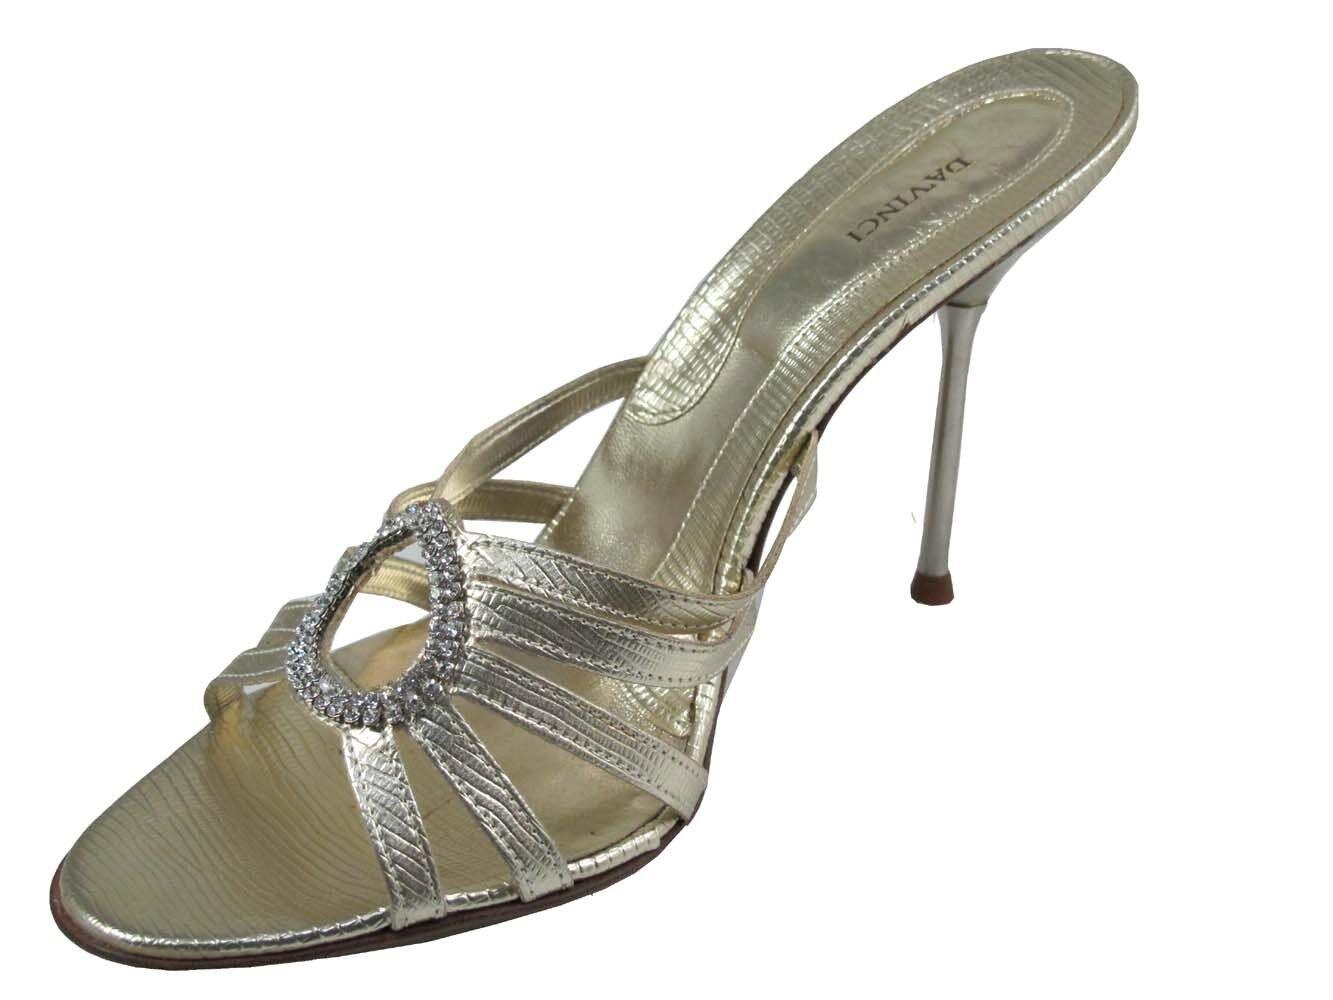 Davinci  1541 Donna  Mid Heel Italian Italian Italian Slide Sandal Light oro 0d2cc4